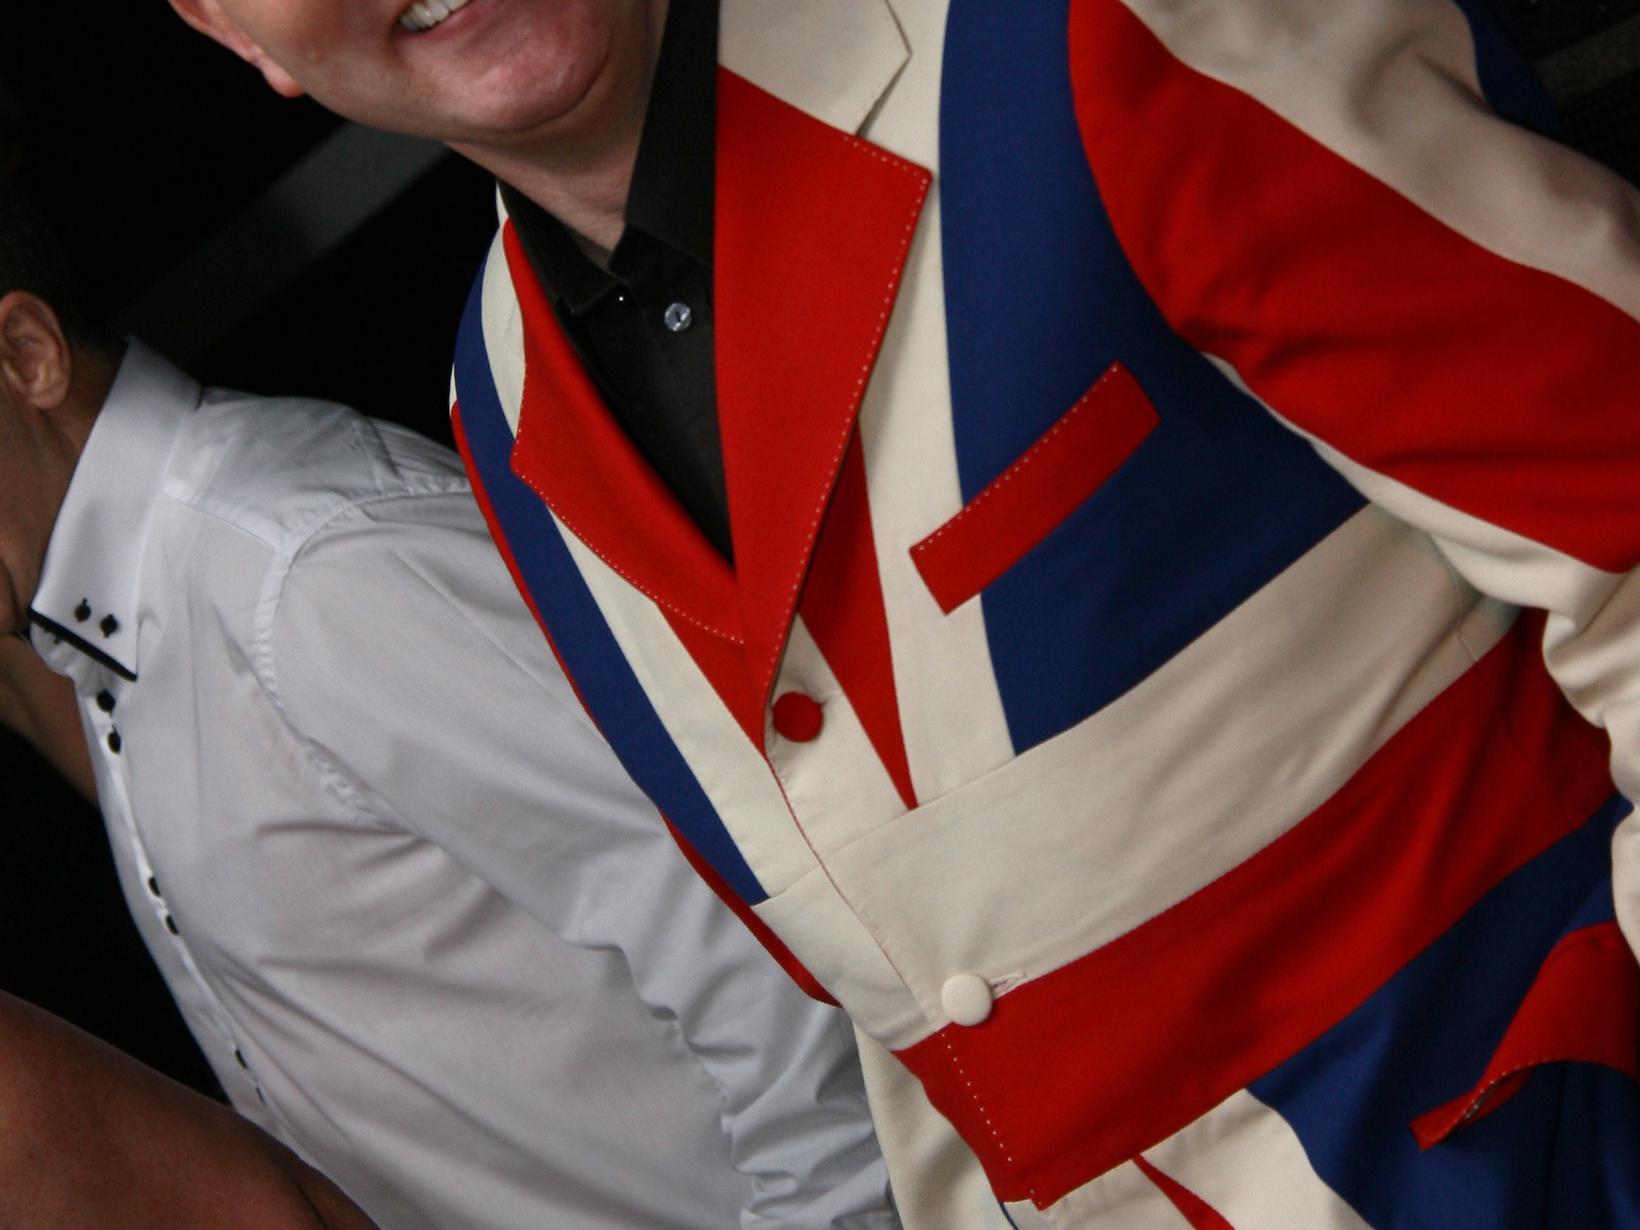 Steven from London, United Kingdom